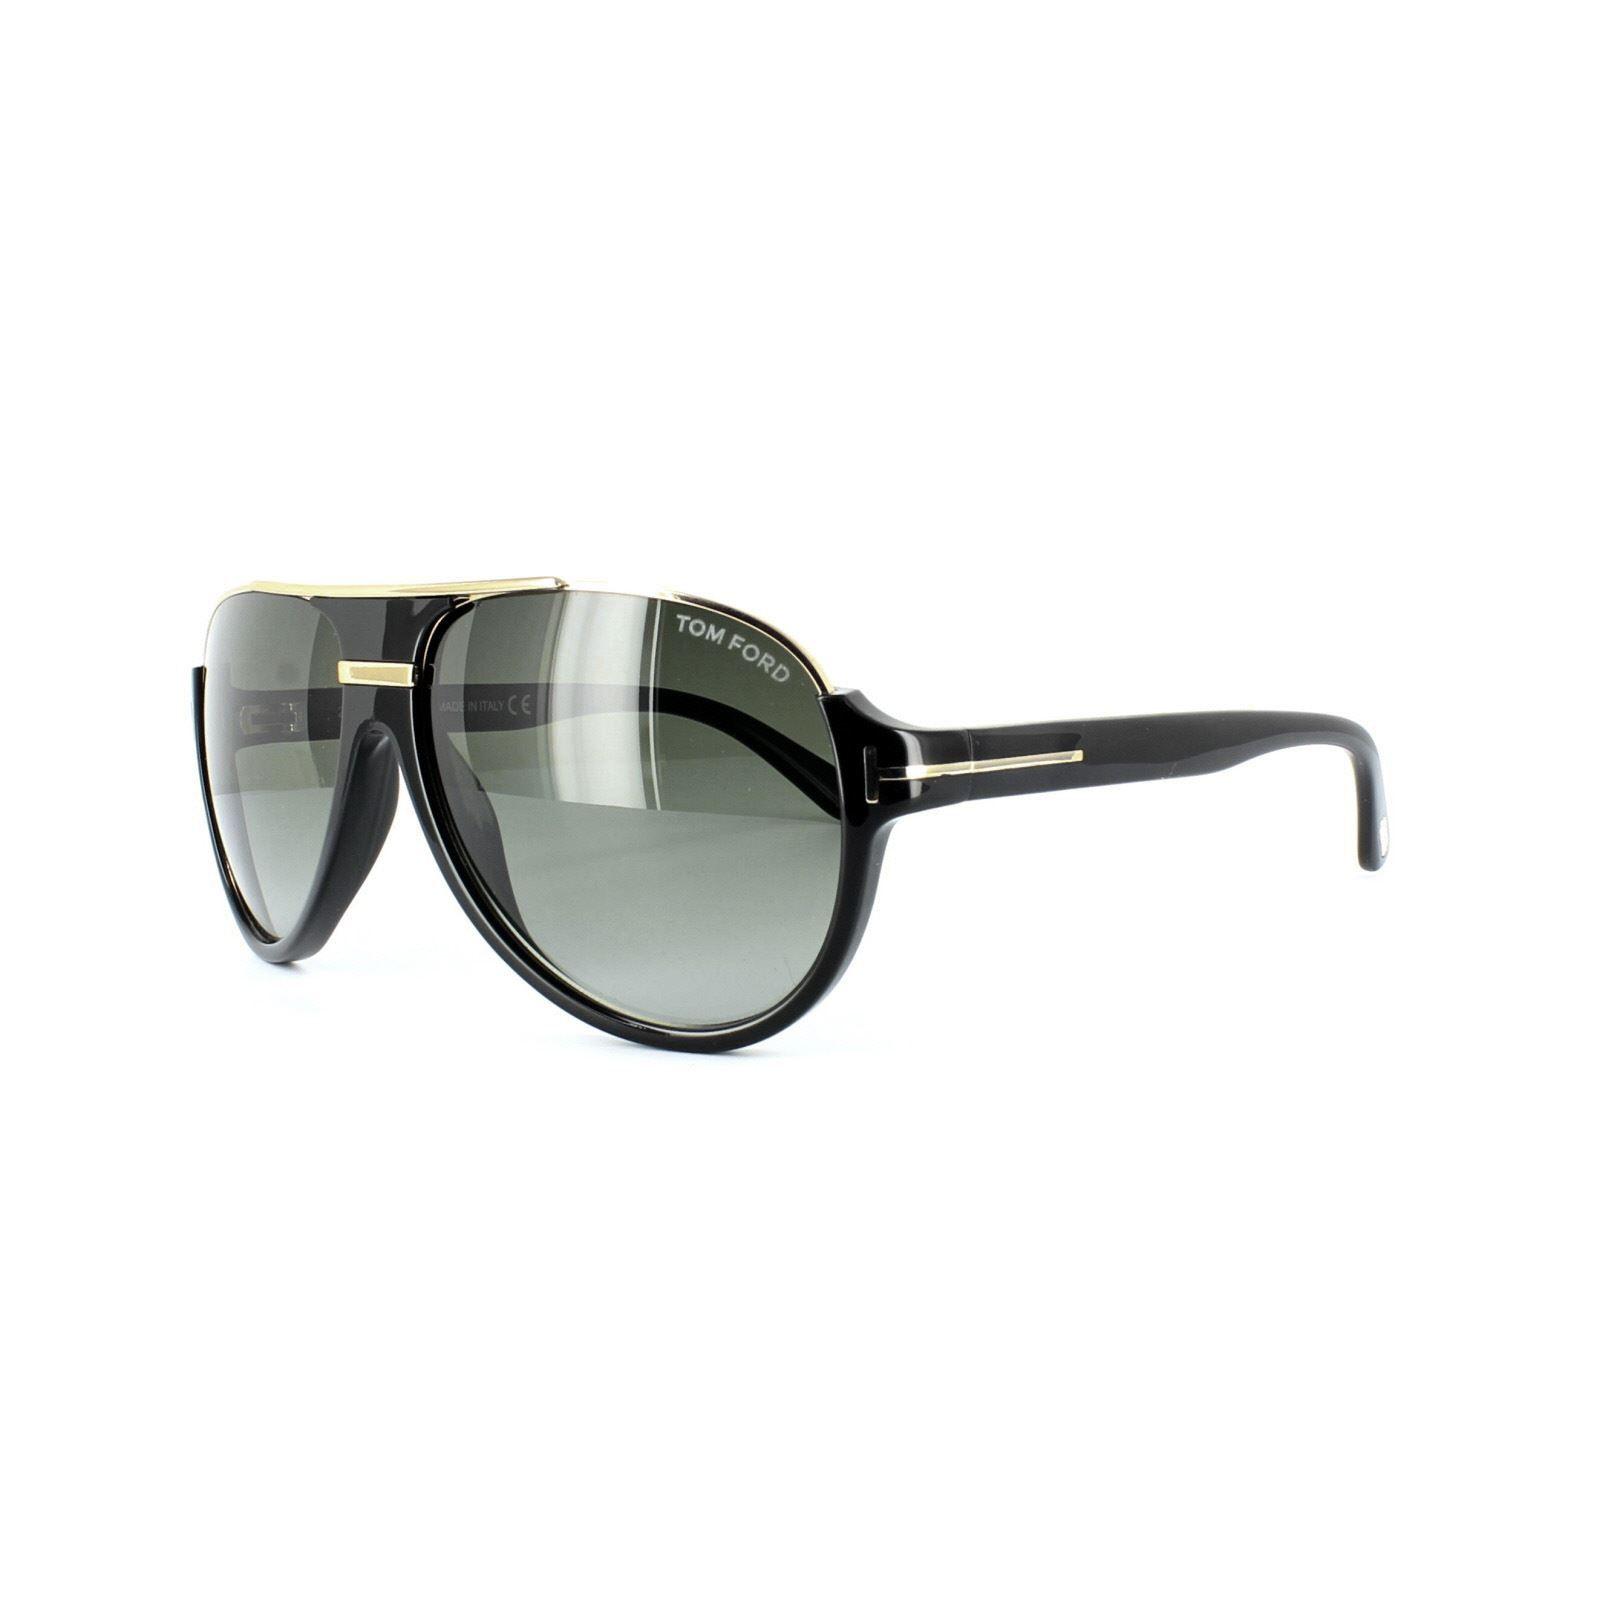 Tom Ford Sunglasses 0334 Dimitry 01P Shiny Black Green Gradient